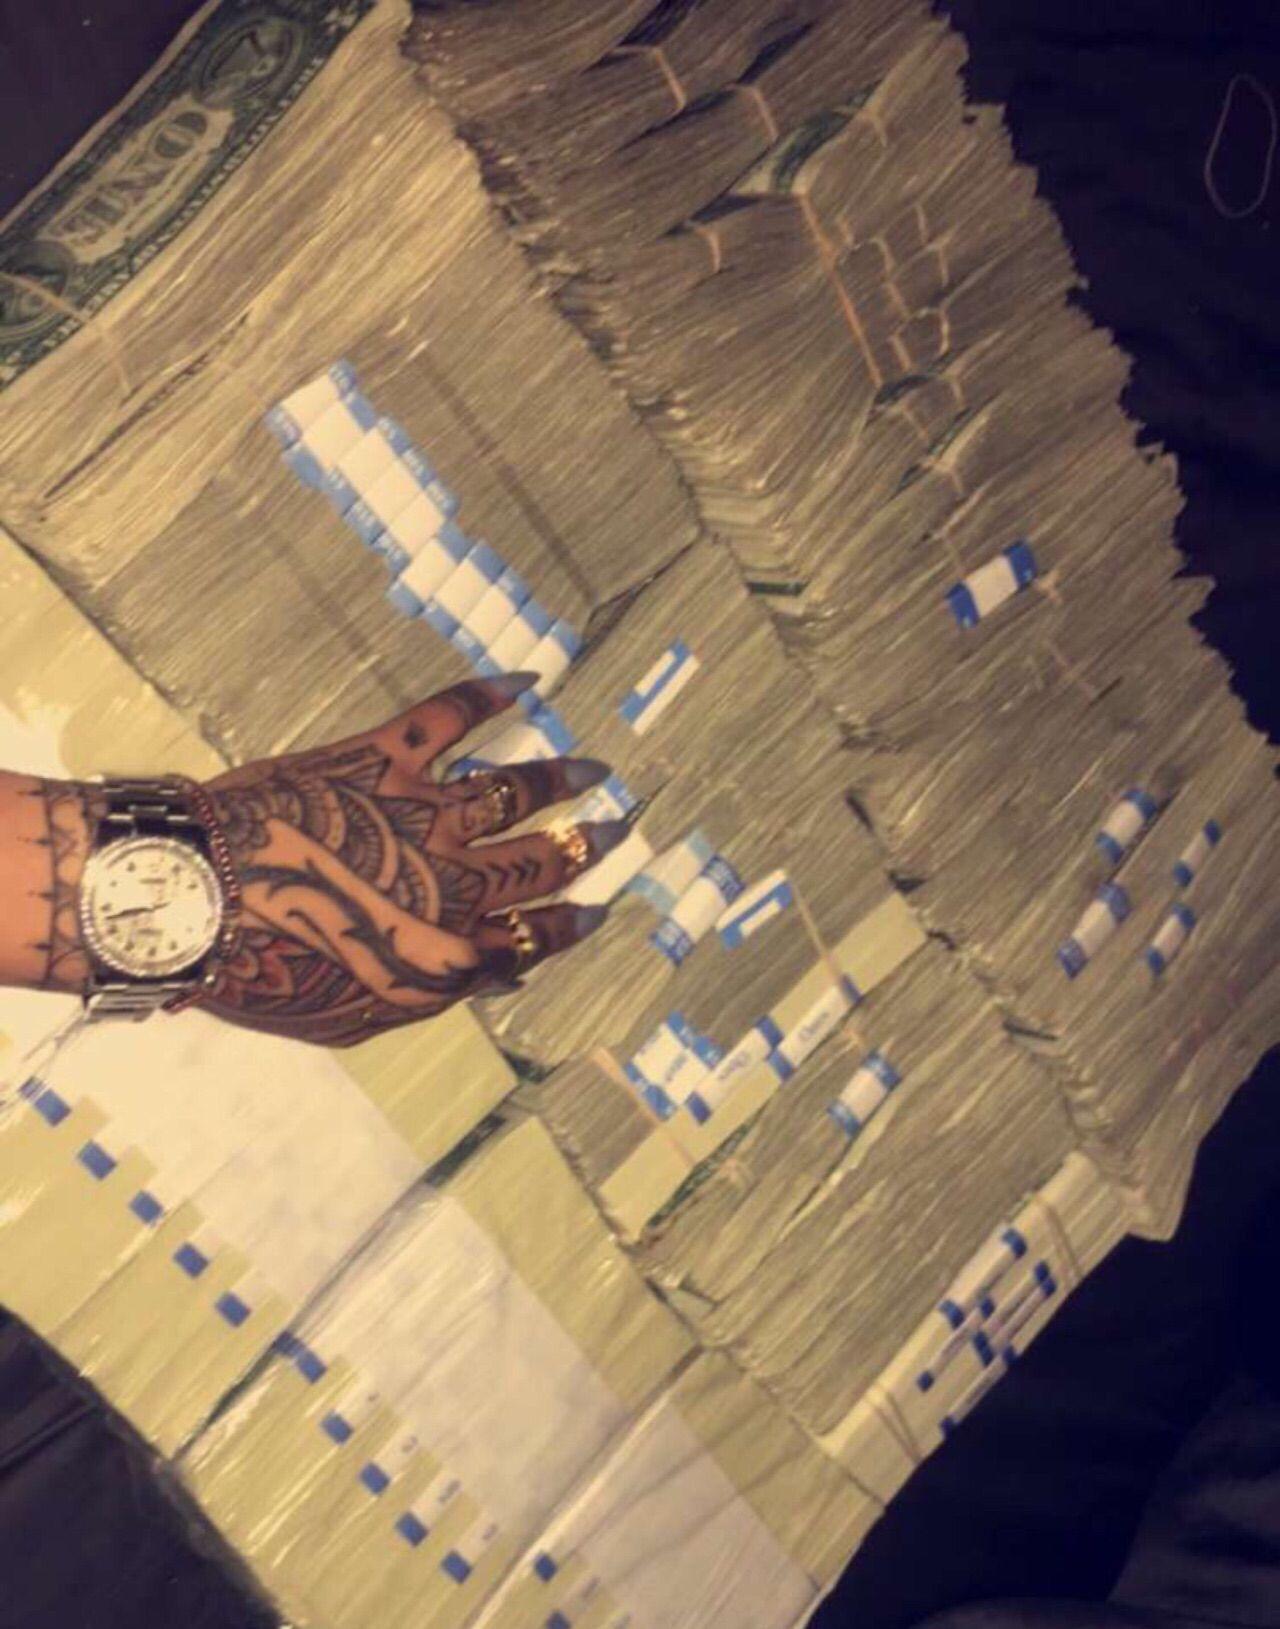 More Than Likely Stripper Money But Hell Still Goals